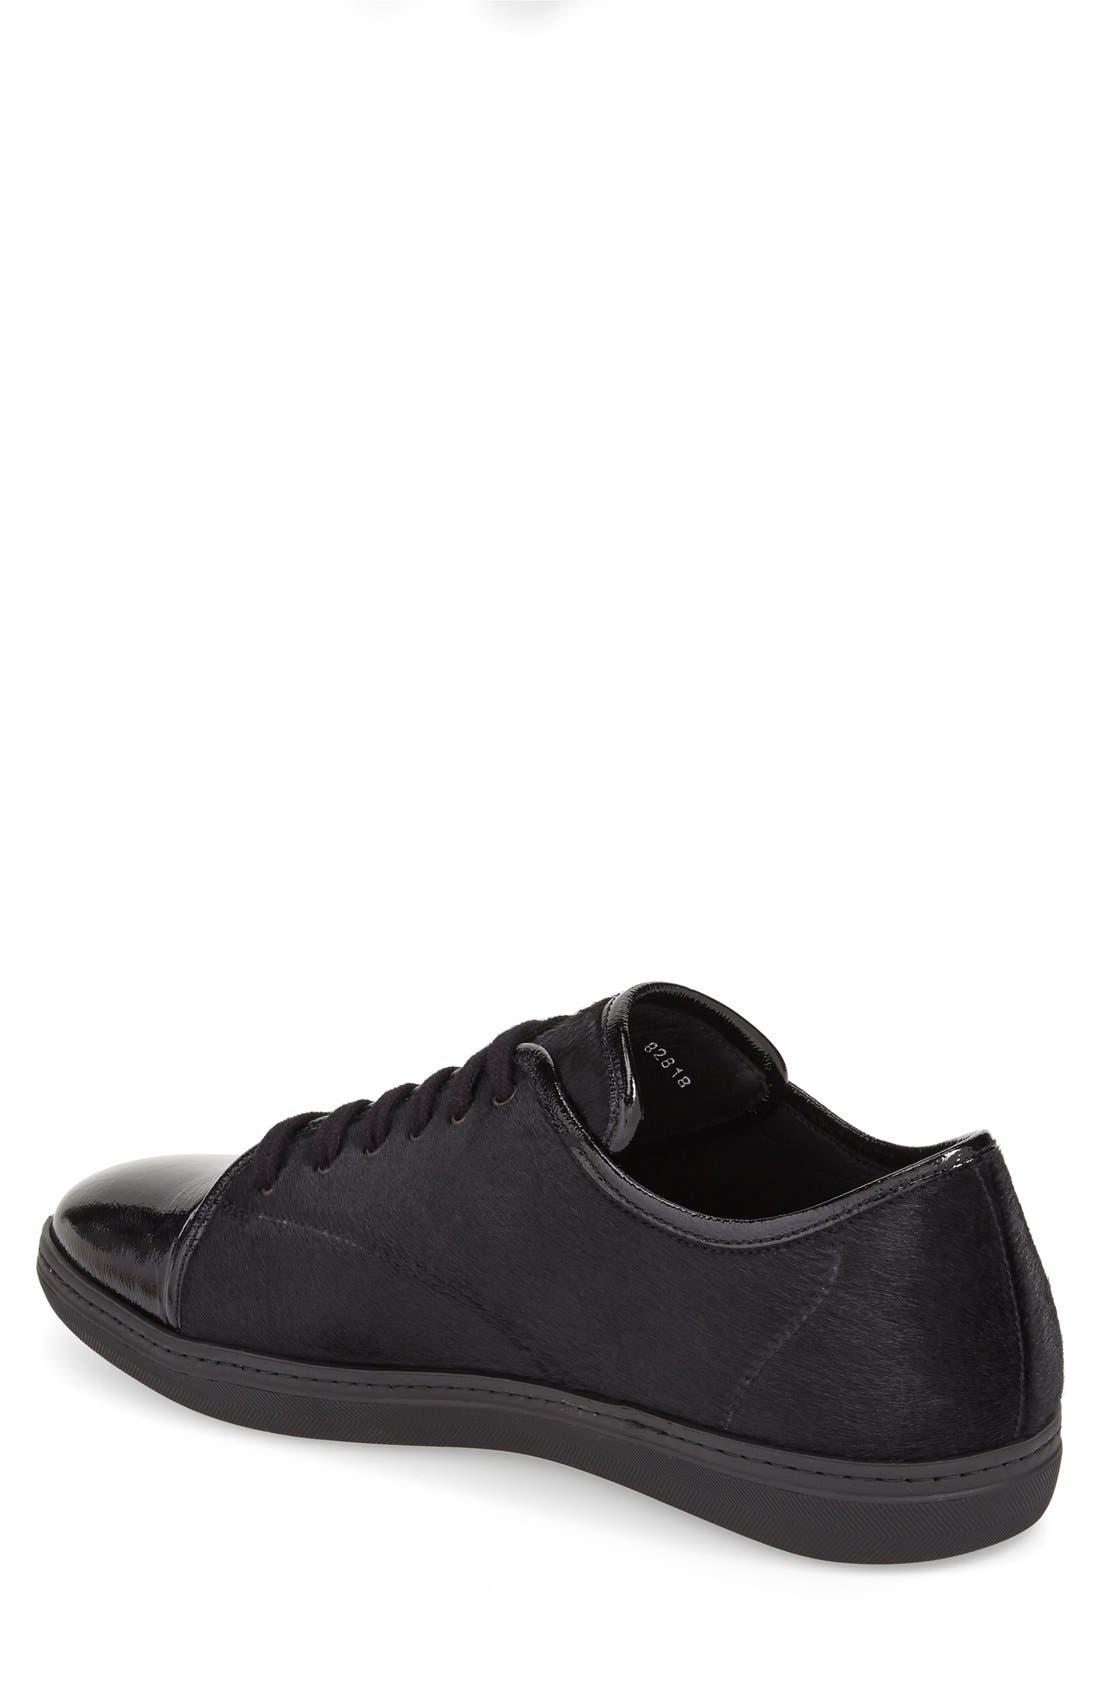 'Scala' Genuine Calf Hair Sneaker,                             Alternate thumbnail 2, color,                             Black